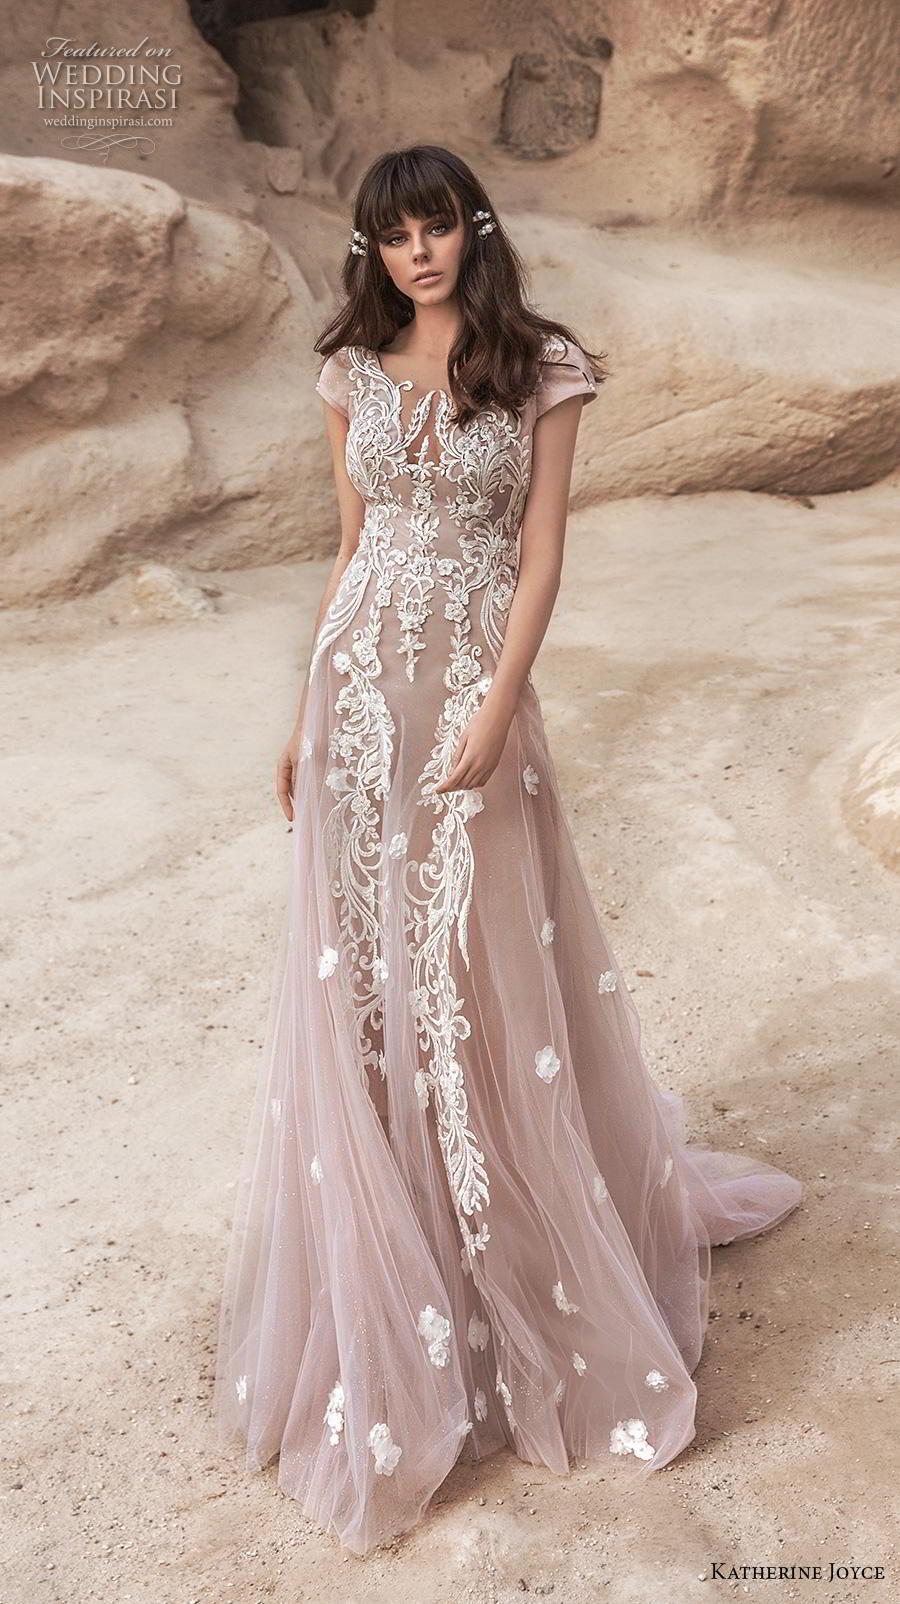 katherine joyce 2020 bridal cap sleeves illusion bateau v neck full embellishment romantic blush soft a  line wedding dress backless v back chapel train (2) mv